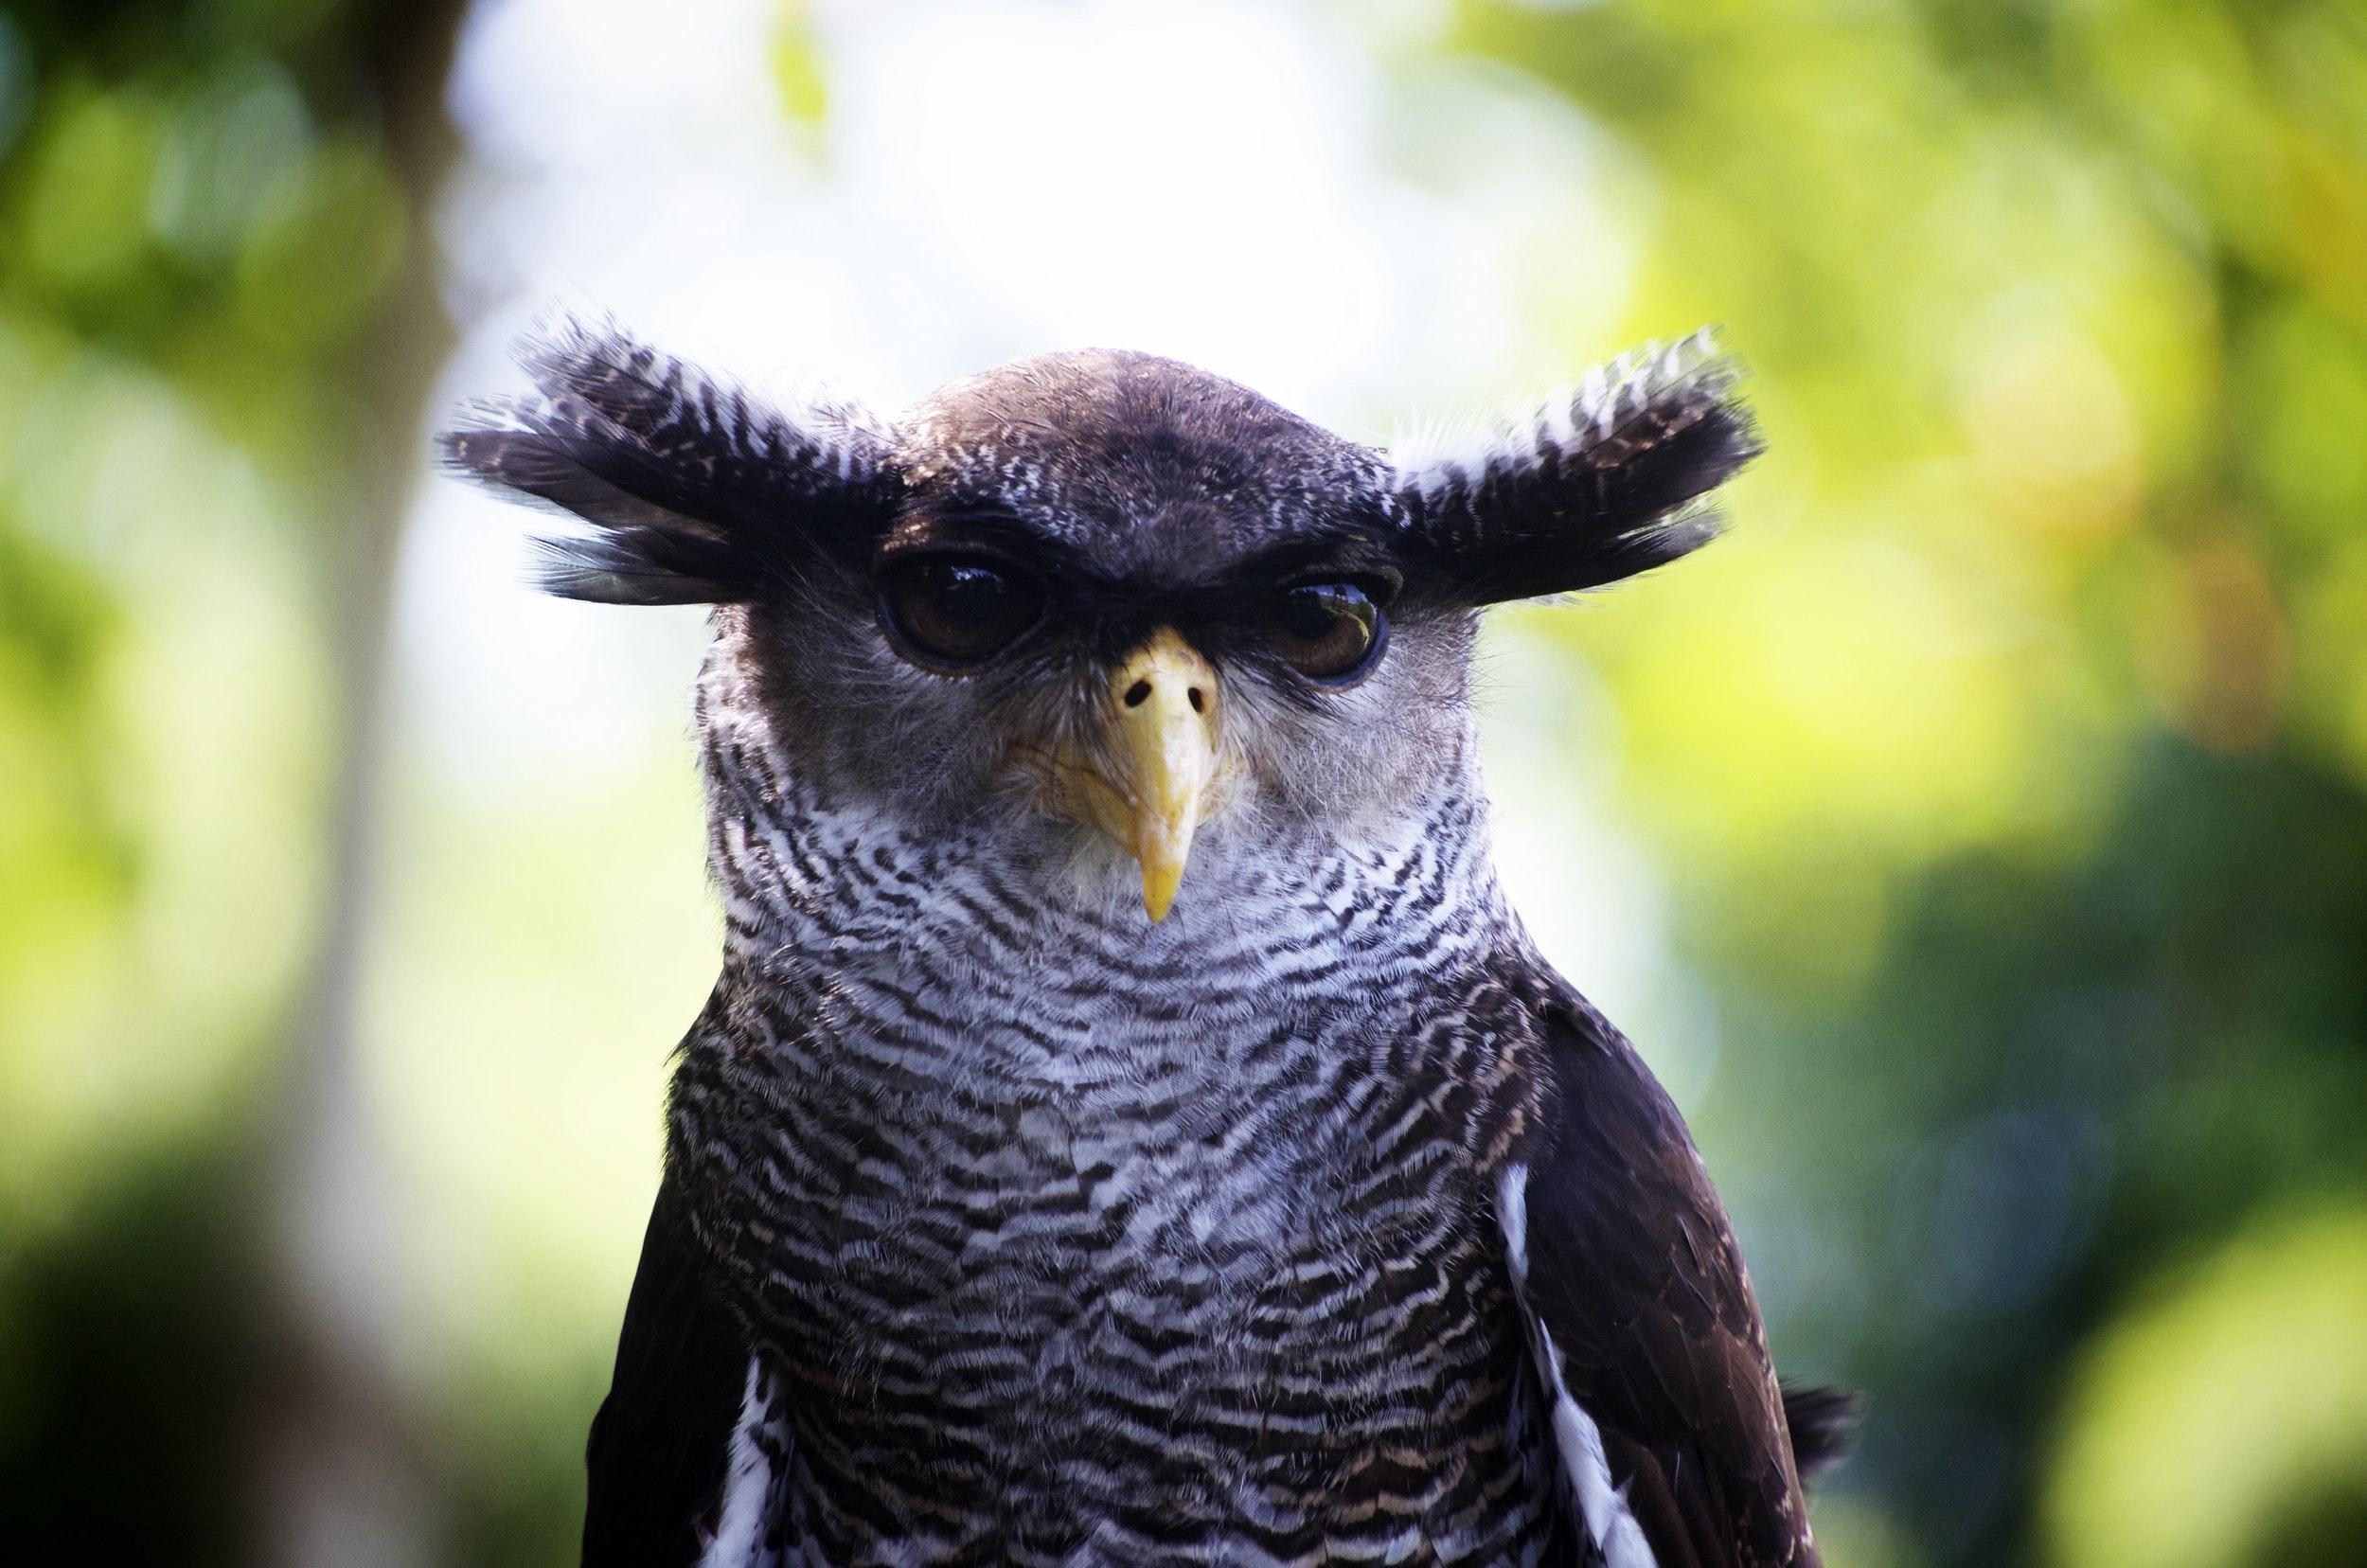 owl-close-up-bird-head (1).jpg